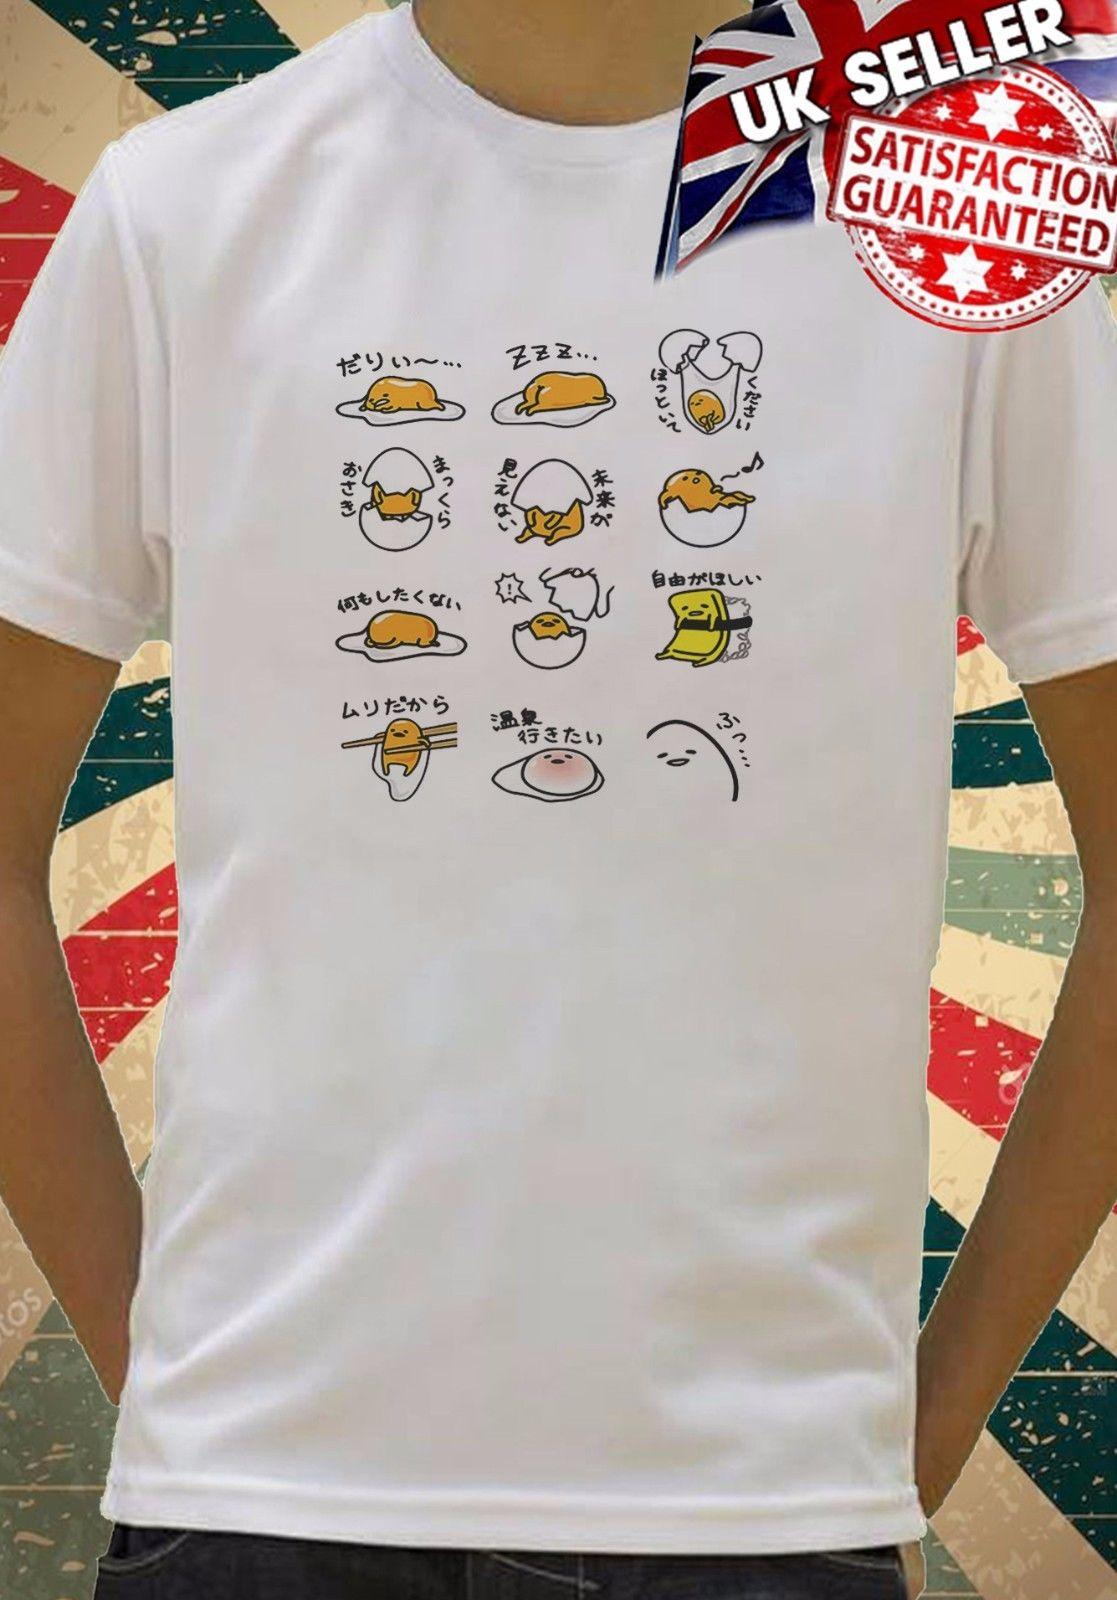 8c5fd5b3 Gudetama JAPANESE Lazy Egg Cool Kids Boys Girls Unisex Top T Shirt 660 Men  Women Unisex Fashion Tshirt Make T Shirts Online Tees Design From ...